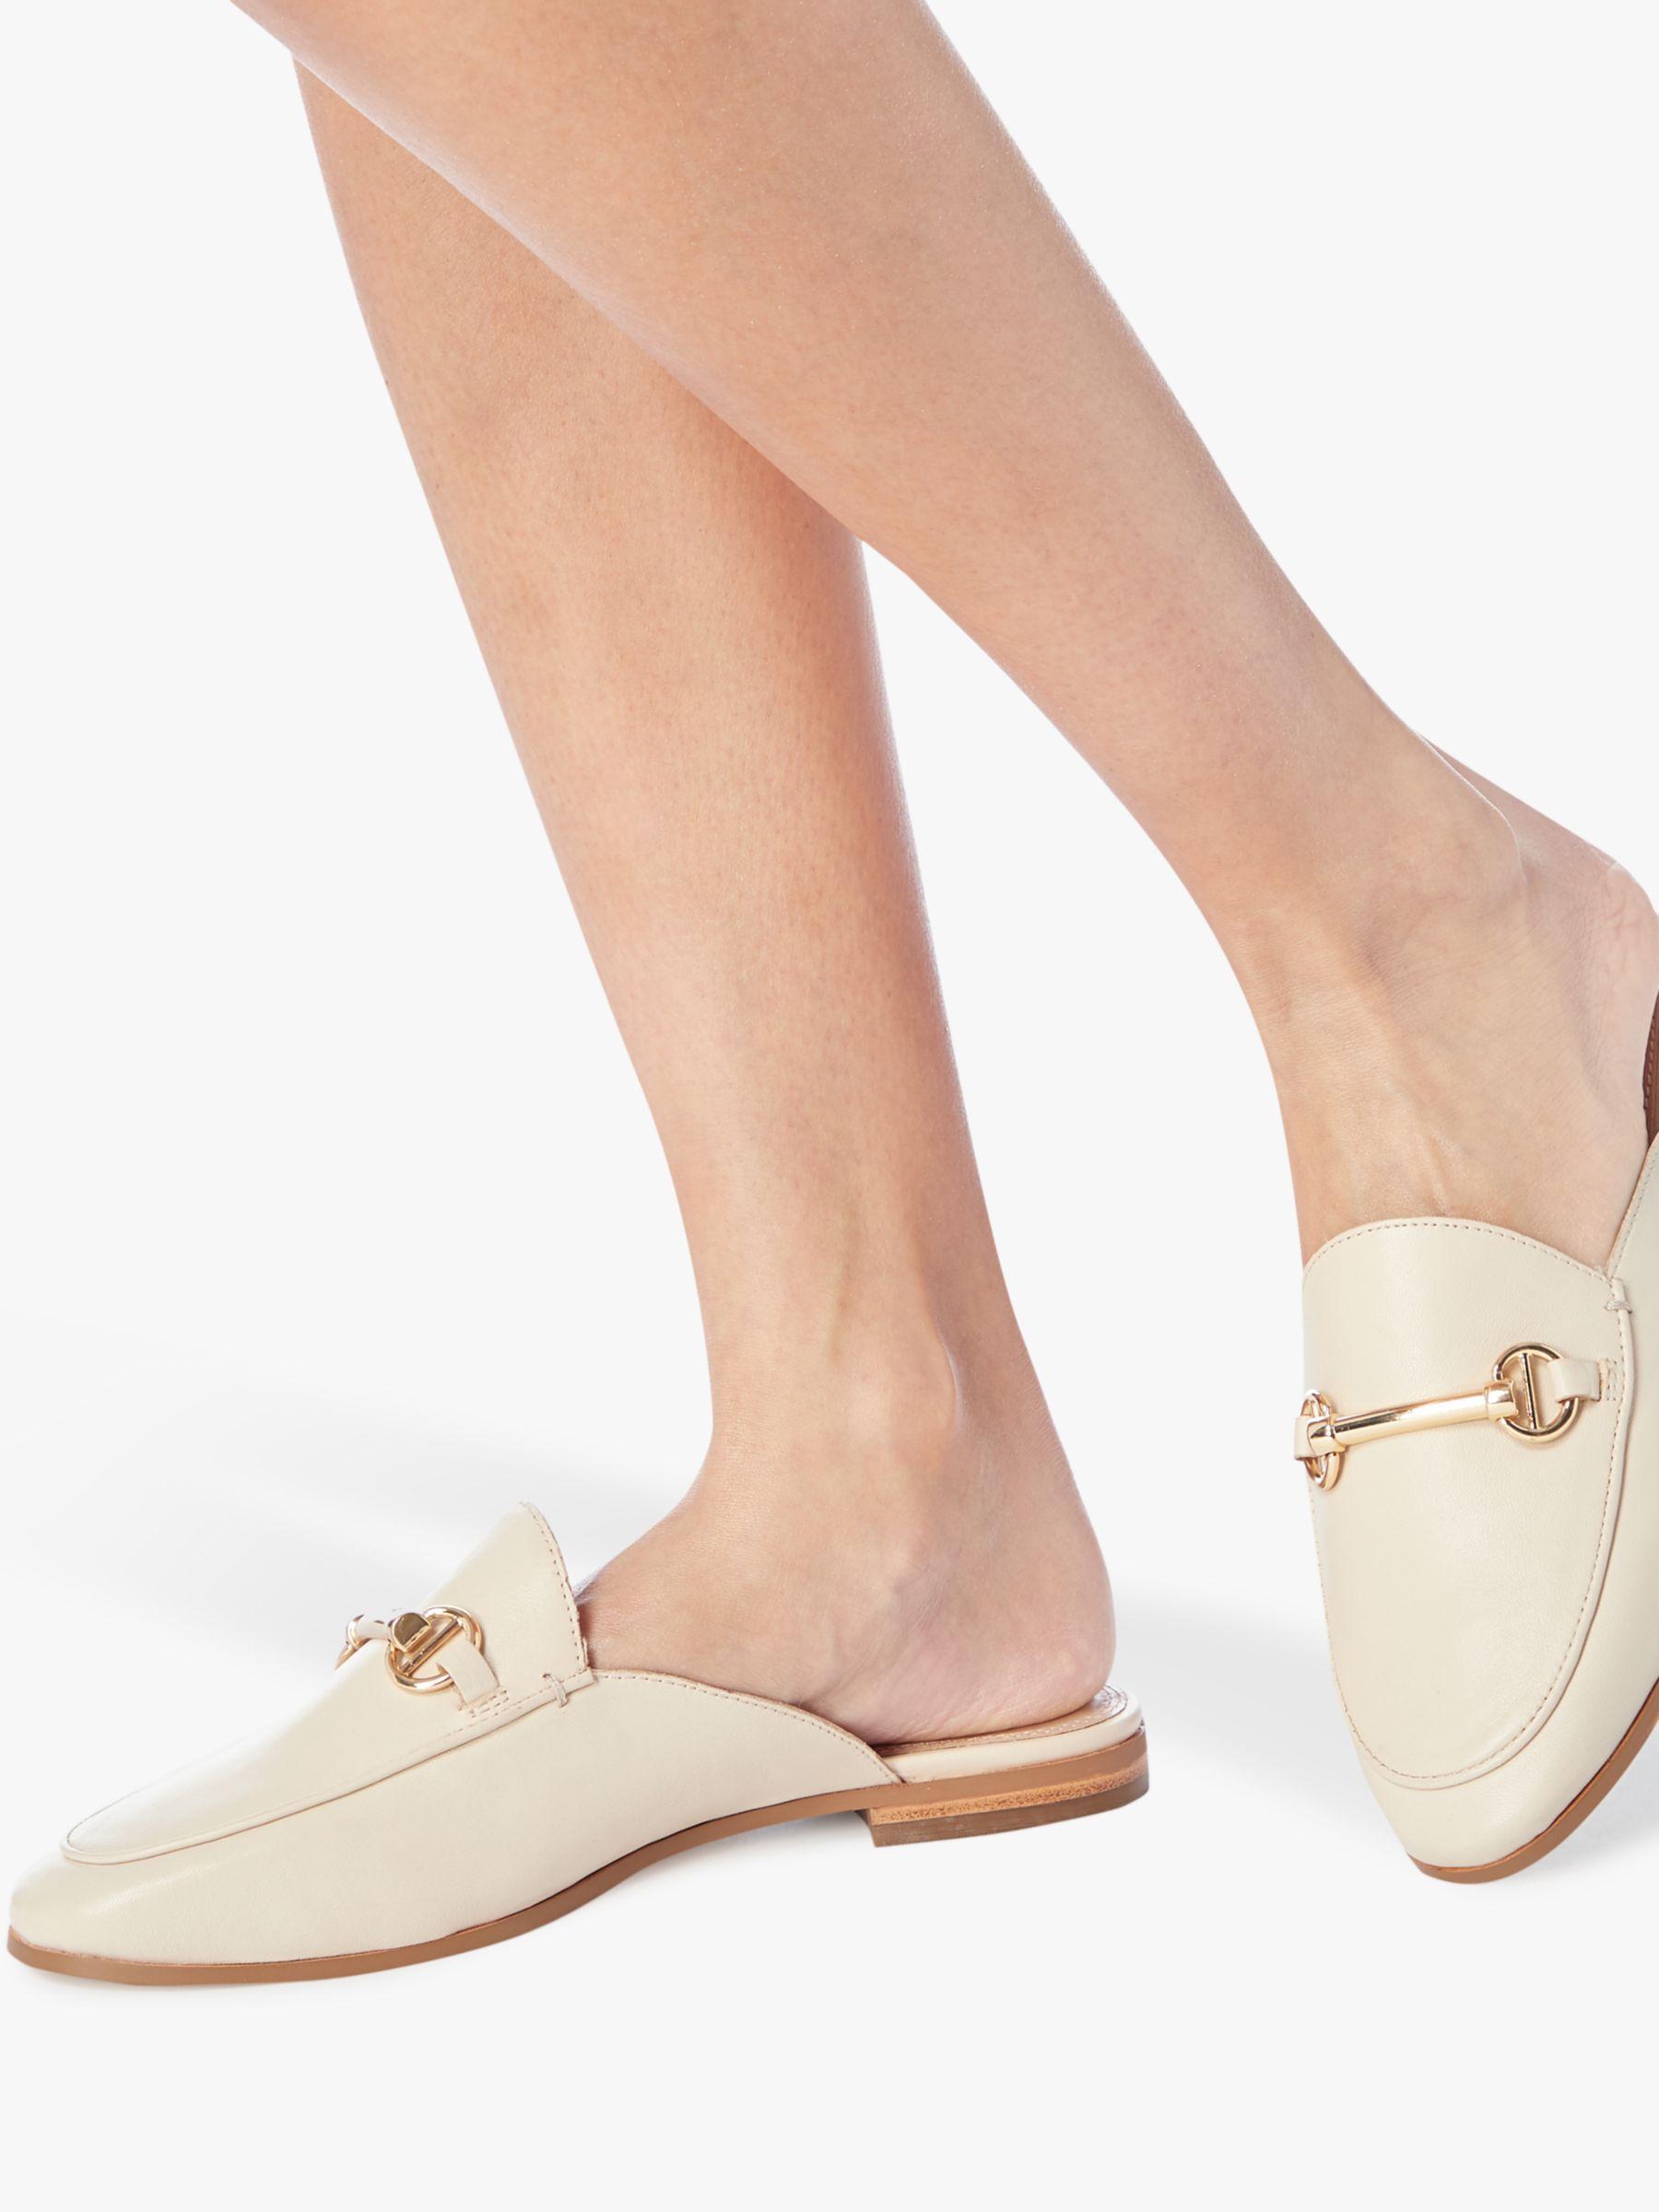 391564cedd5 Dune Geenee Slip On Mule Loafers in White - Lyst